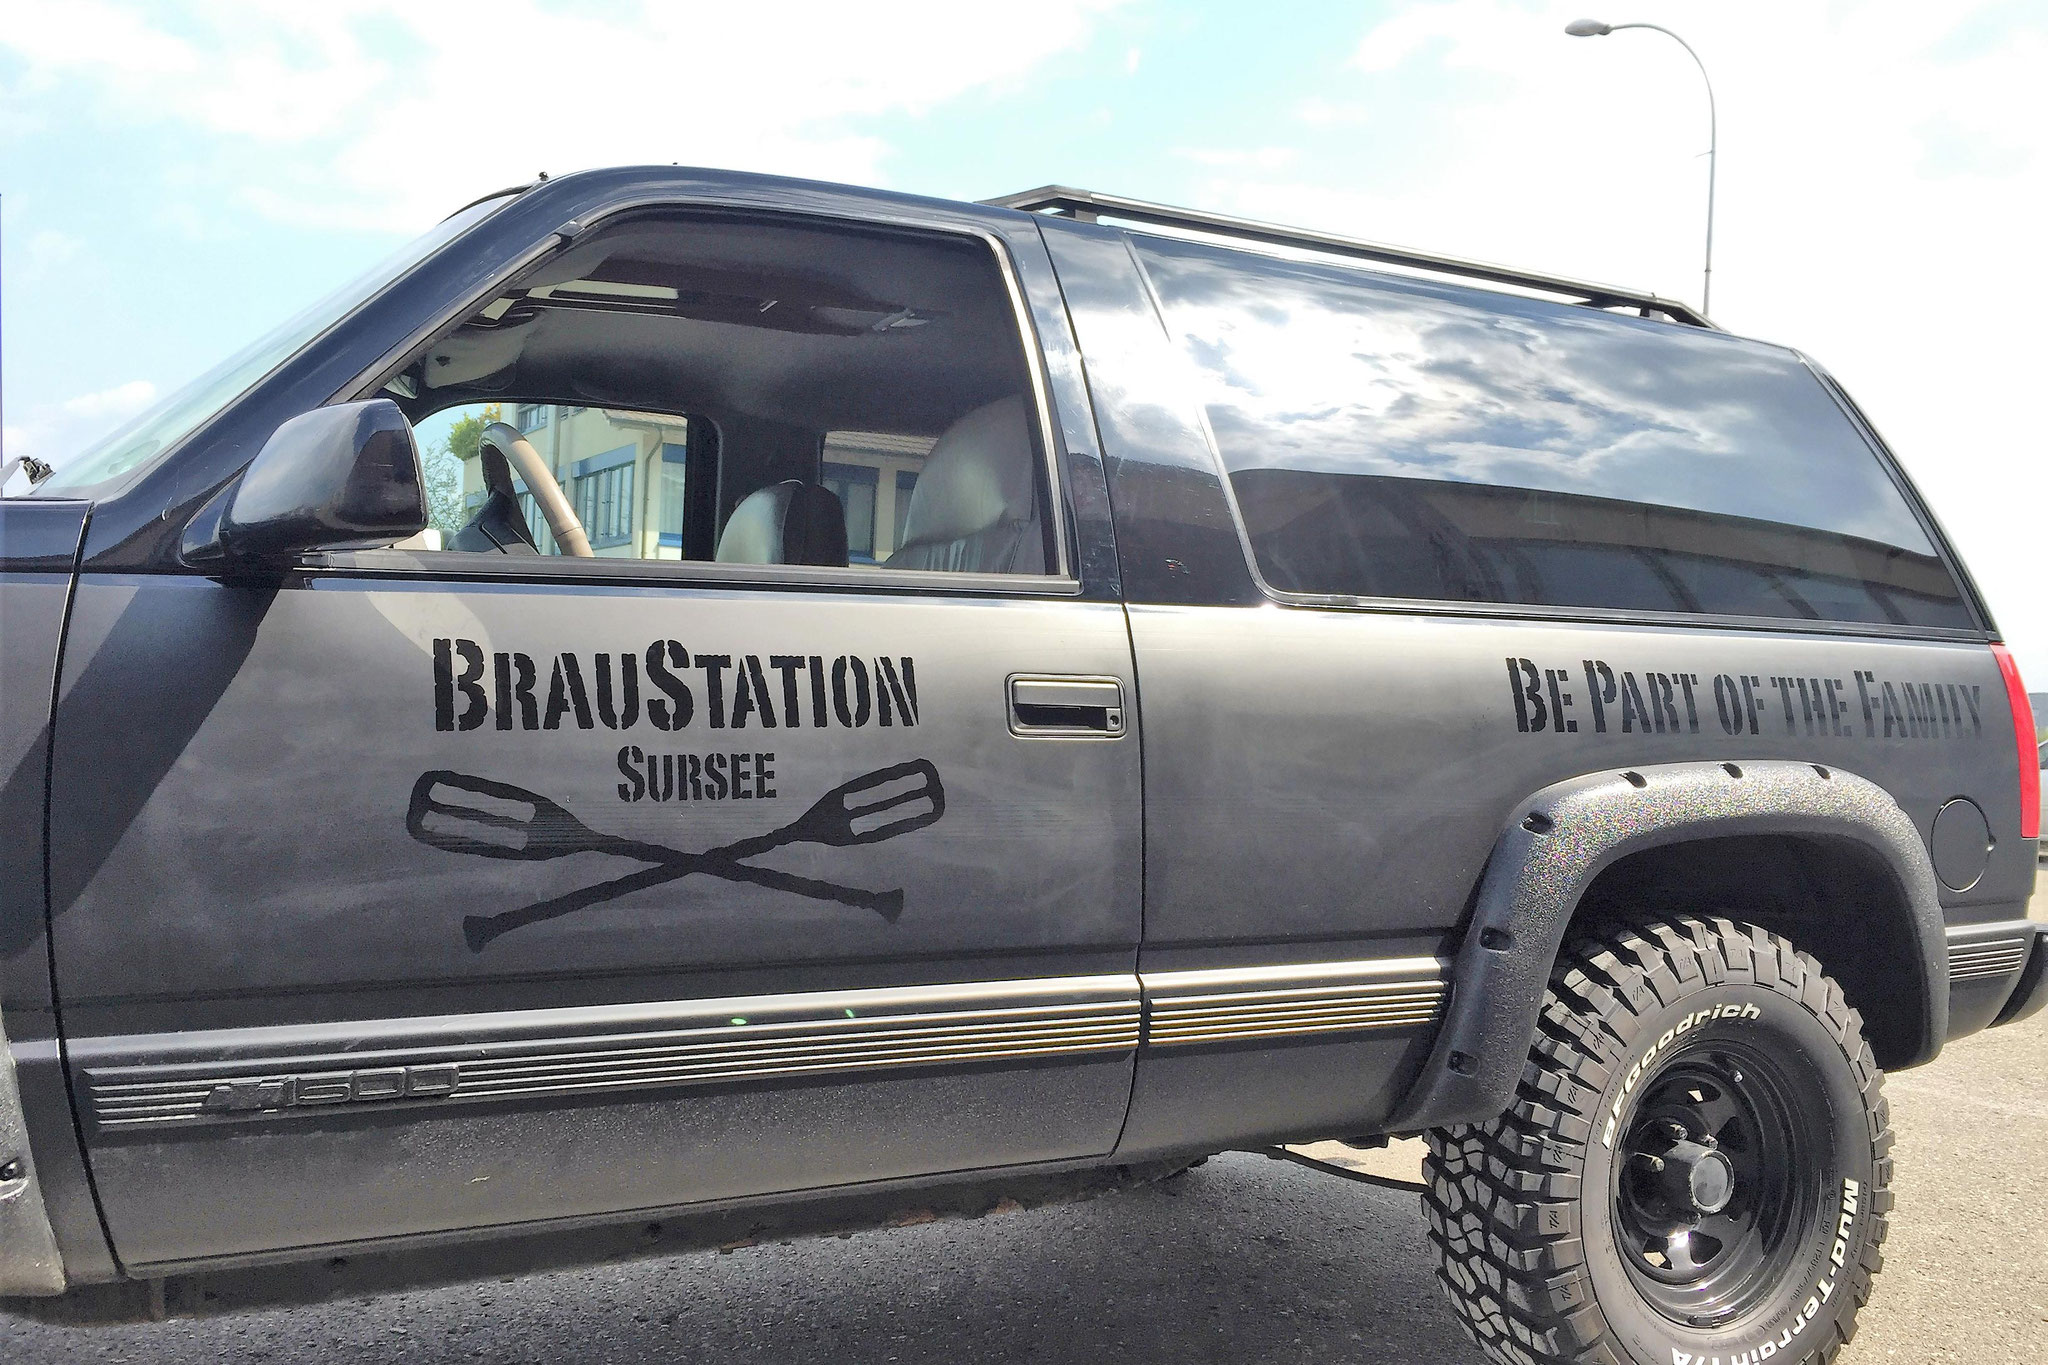 Fahrzeugbeschriftung glanz auf matt, Braustation